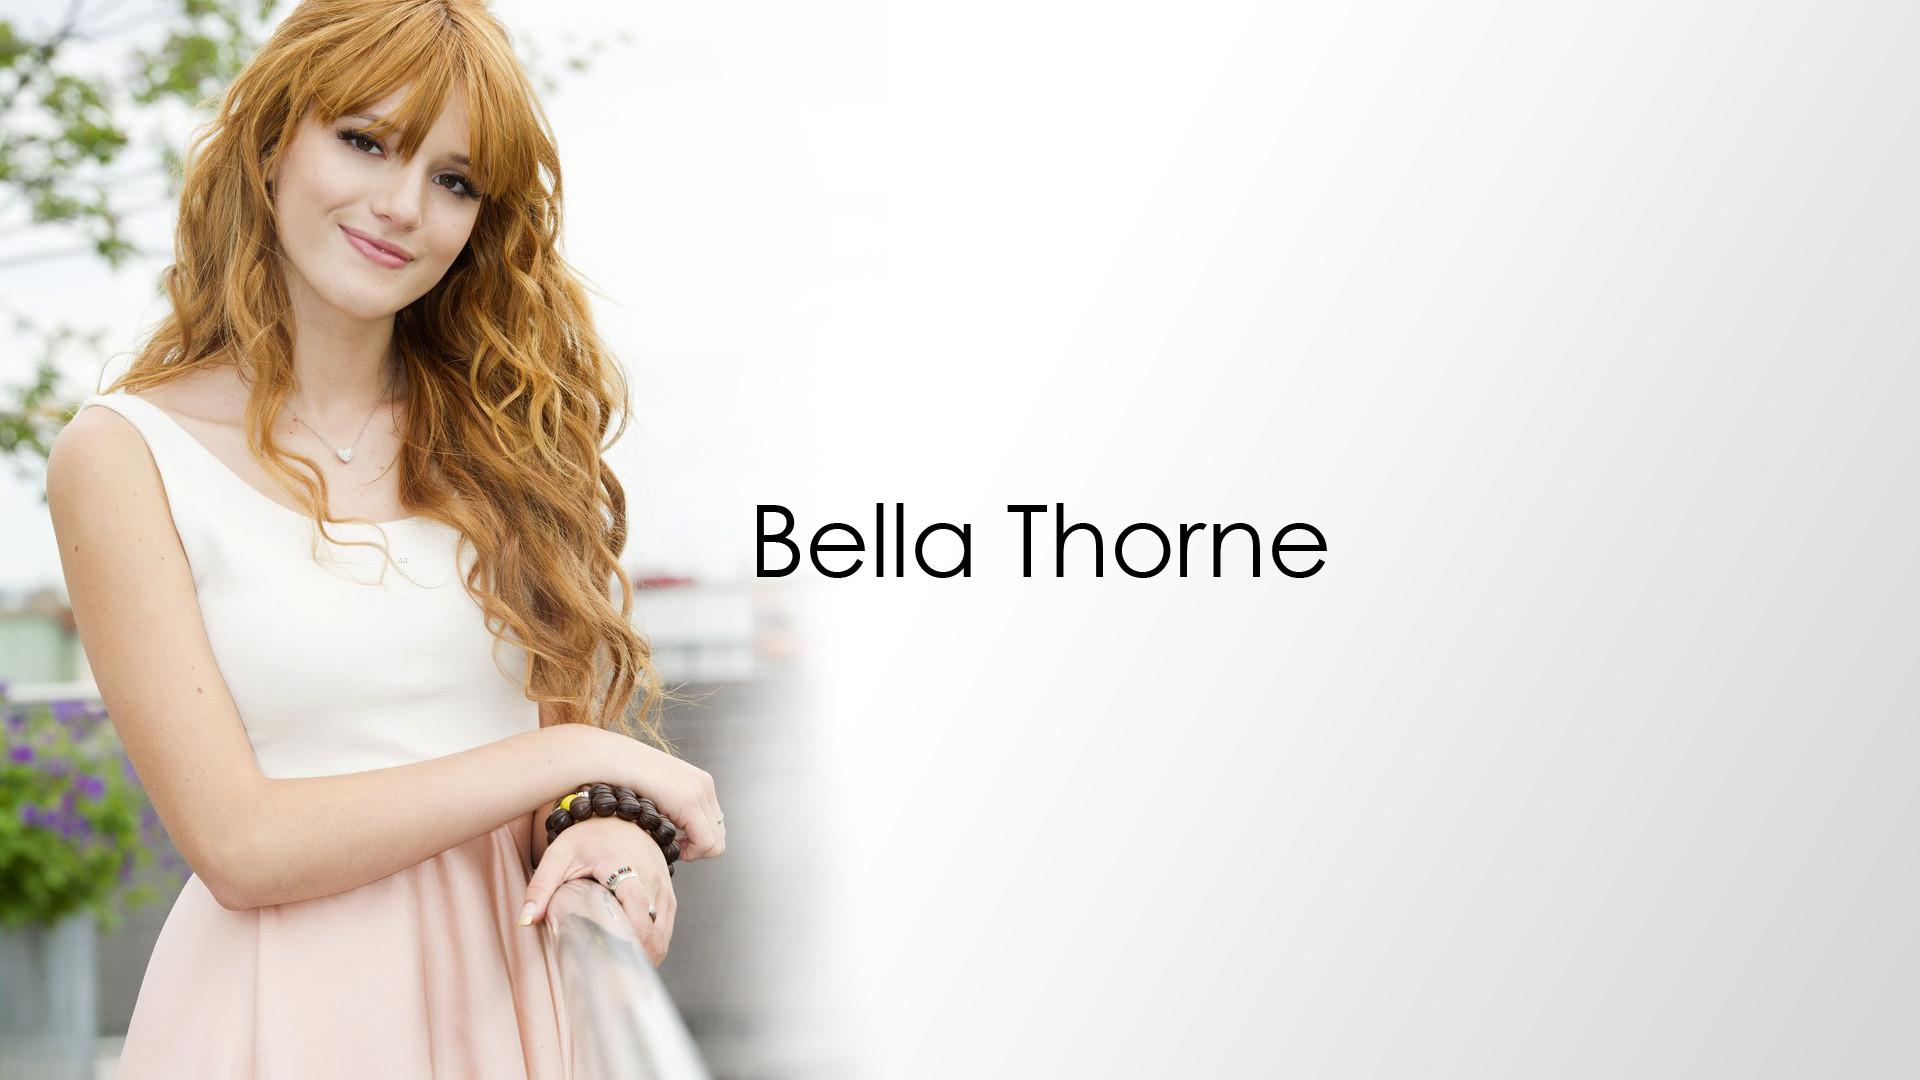 image - bella-thorne-poster | shake it up wiki | fandom powered